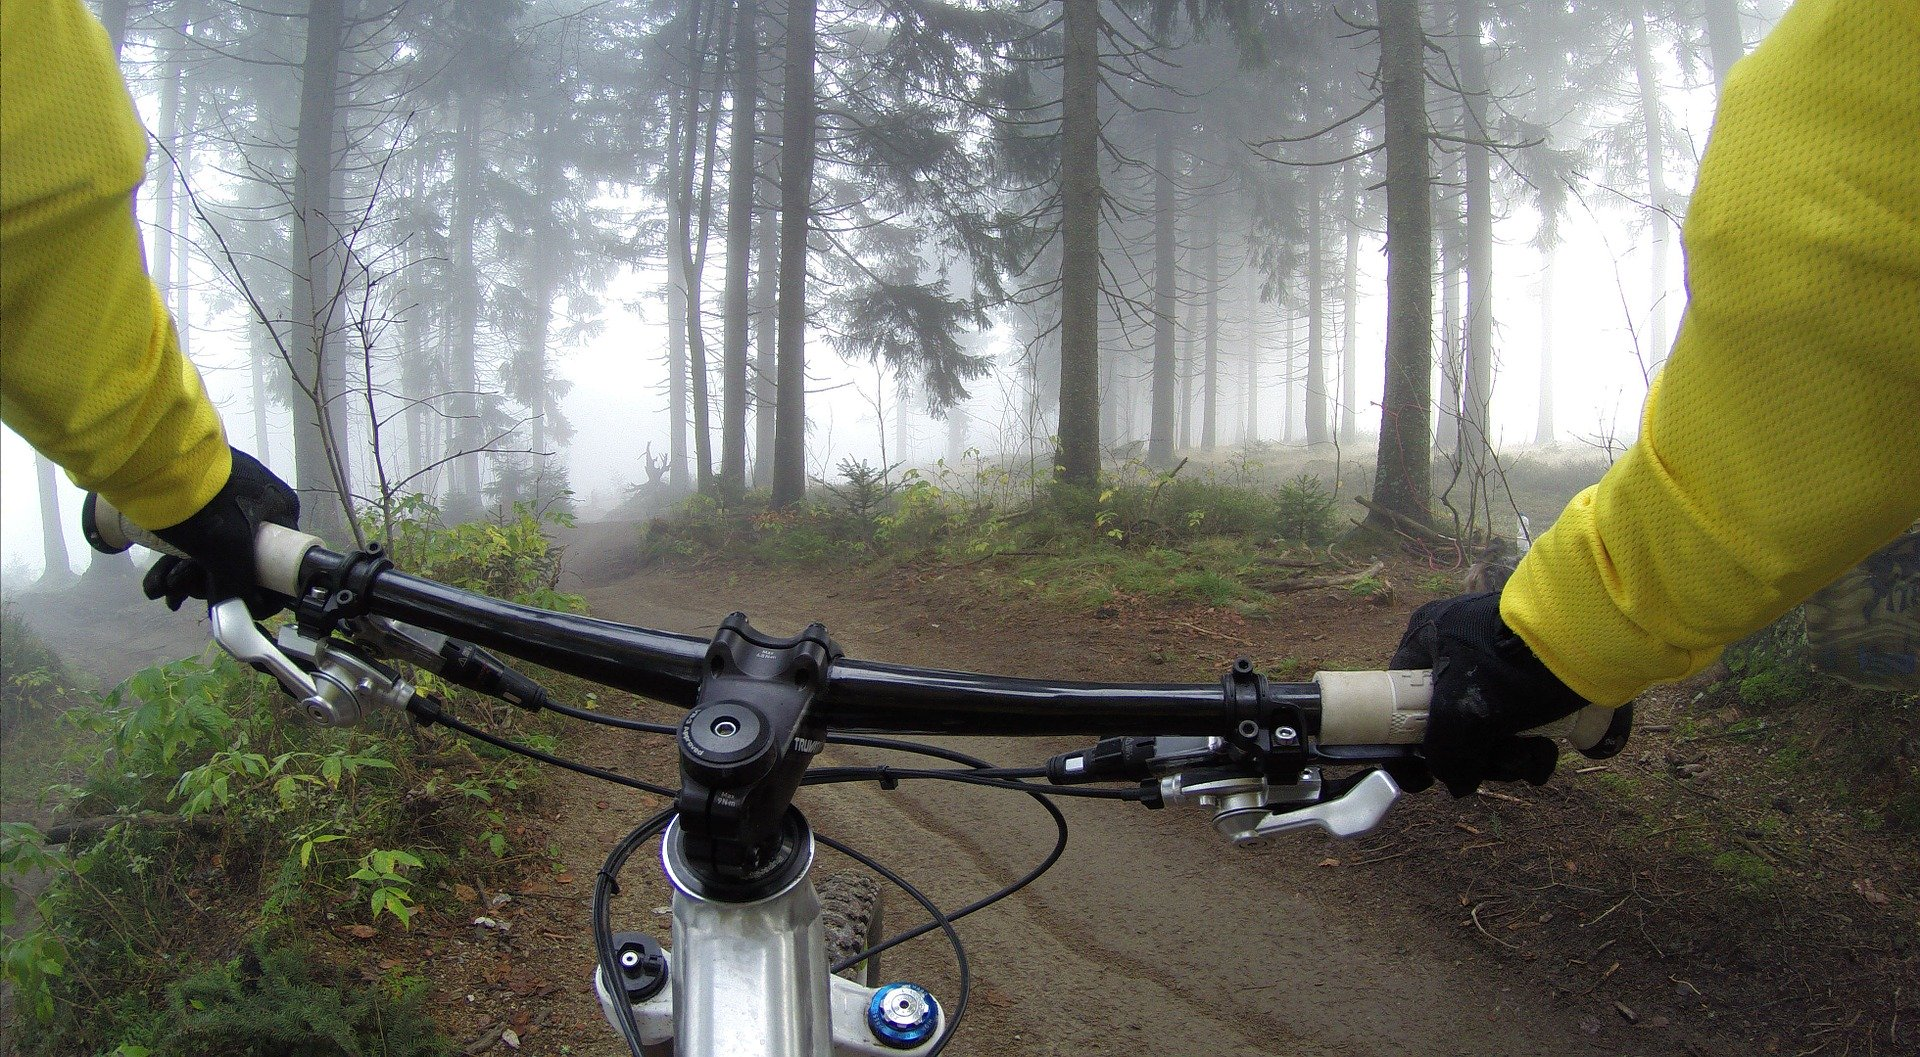 cycling 828646 1920 1